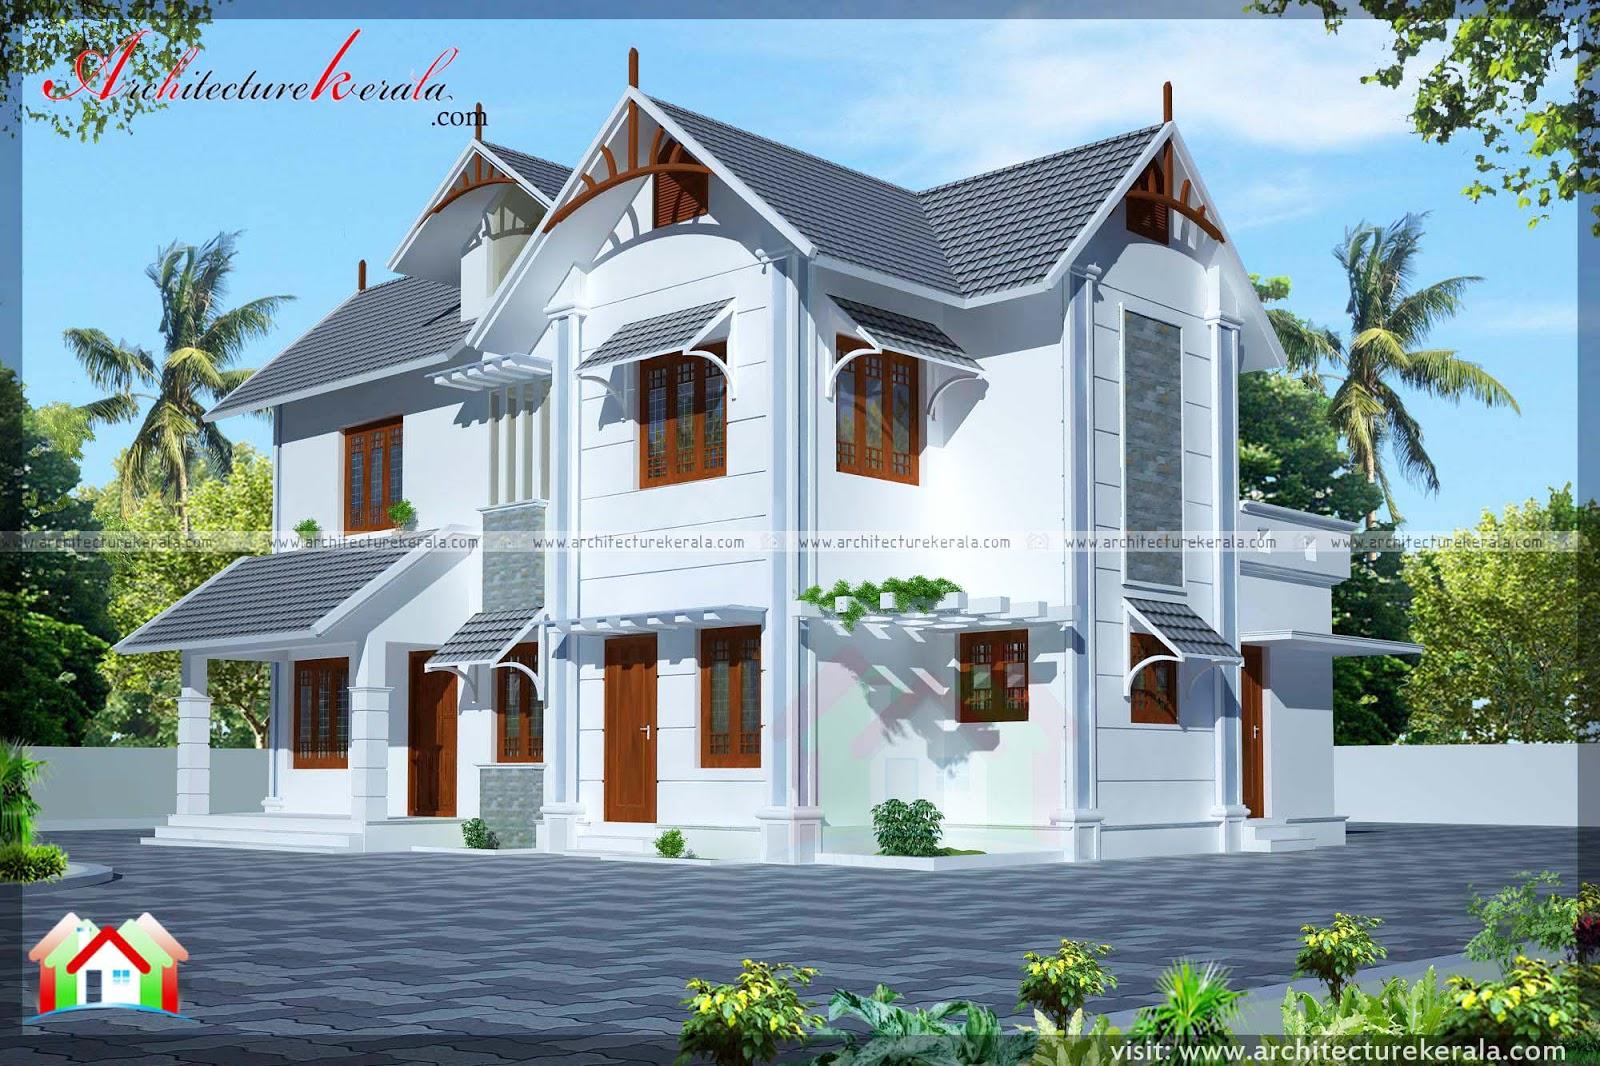 2 floor kerala home design with consultation room office room free kerala home plans. Black Bedroom Furniture Sets. Home Design Ideas